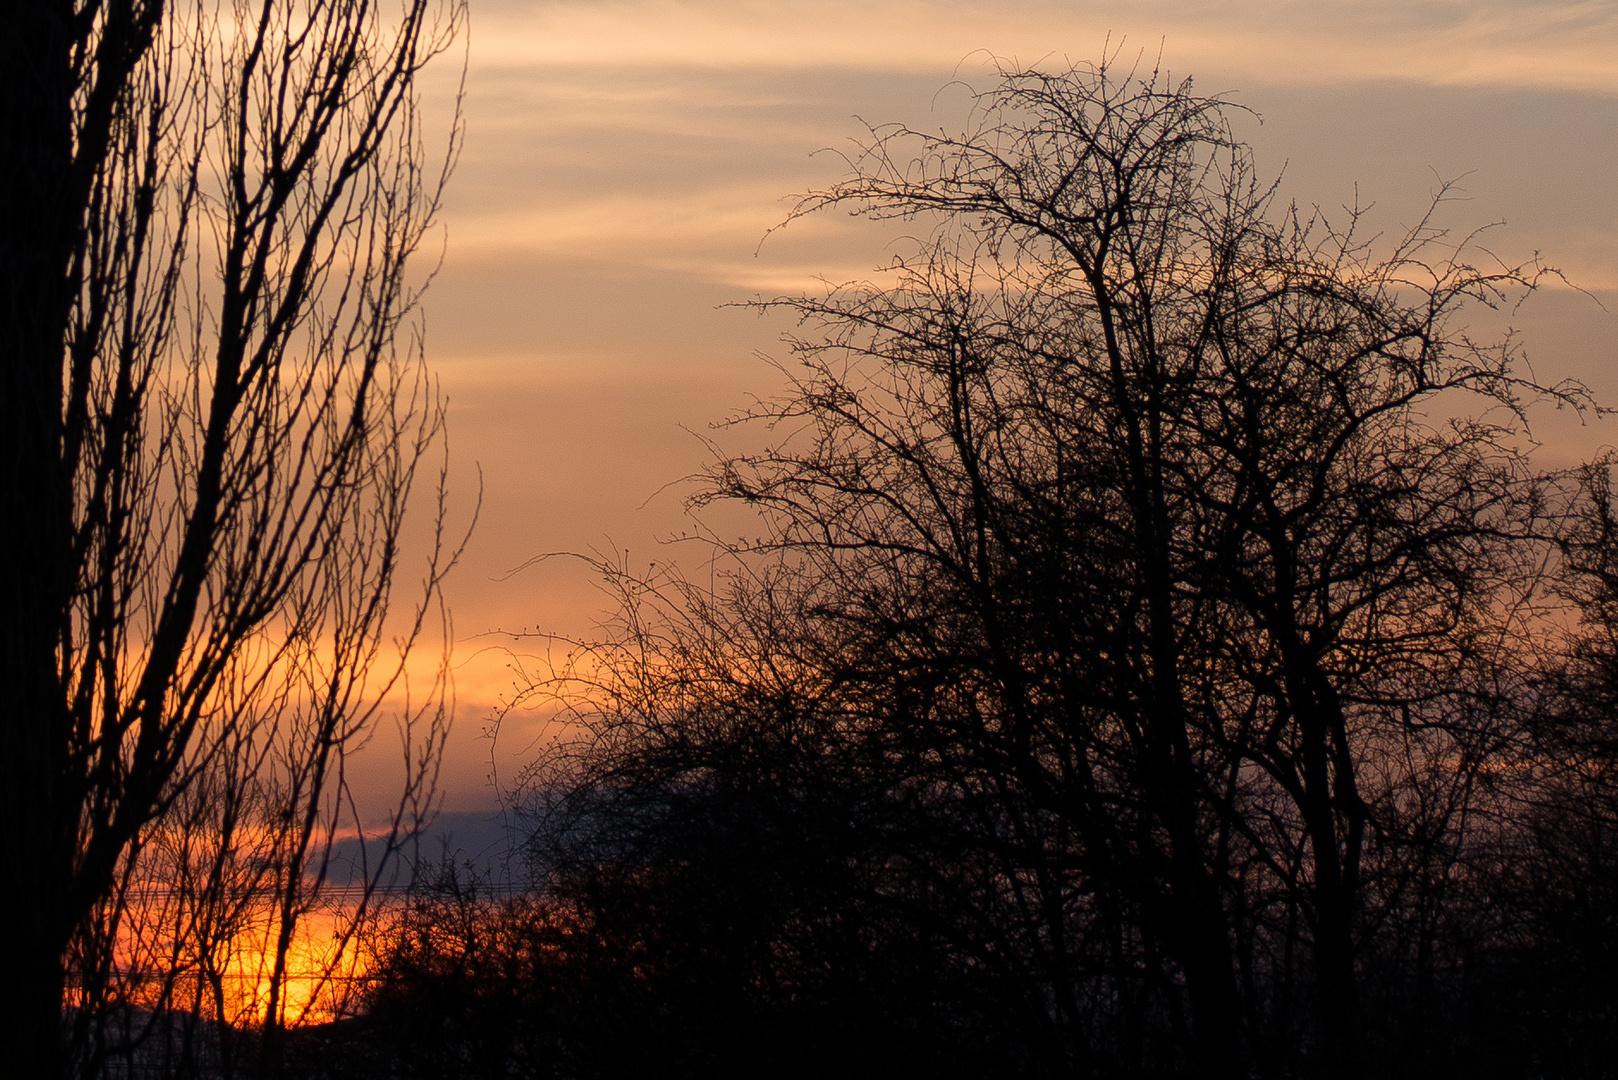 Sonnenuntergang - Detailvergrößerung